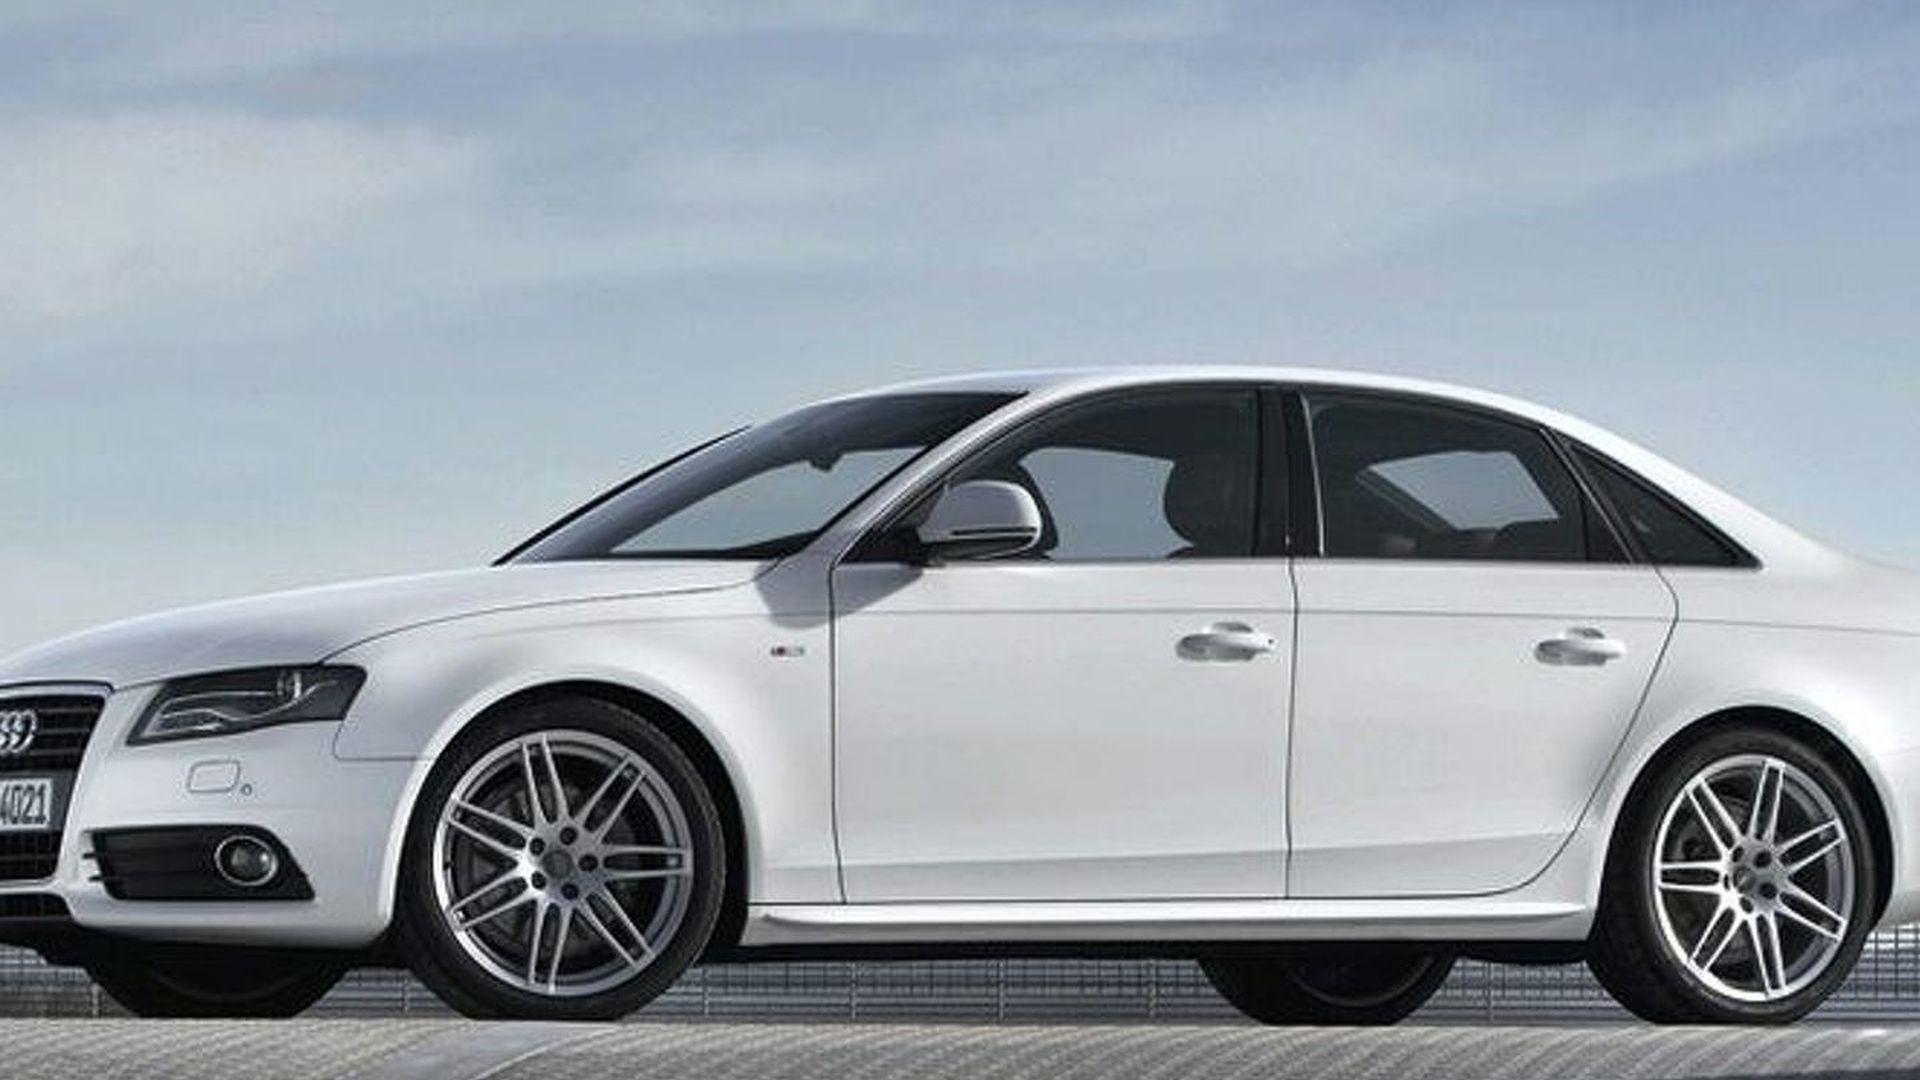 Kelebihan Kekurangan Audi 2009 Murah Berkualitas